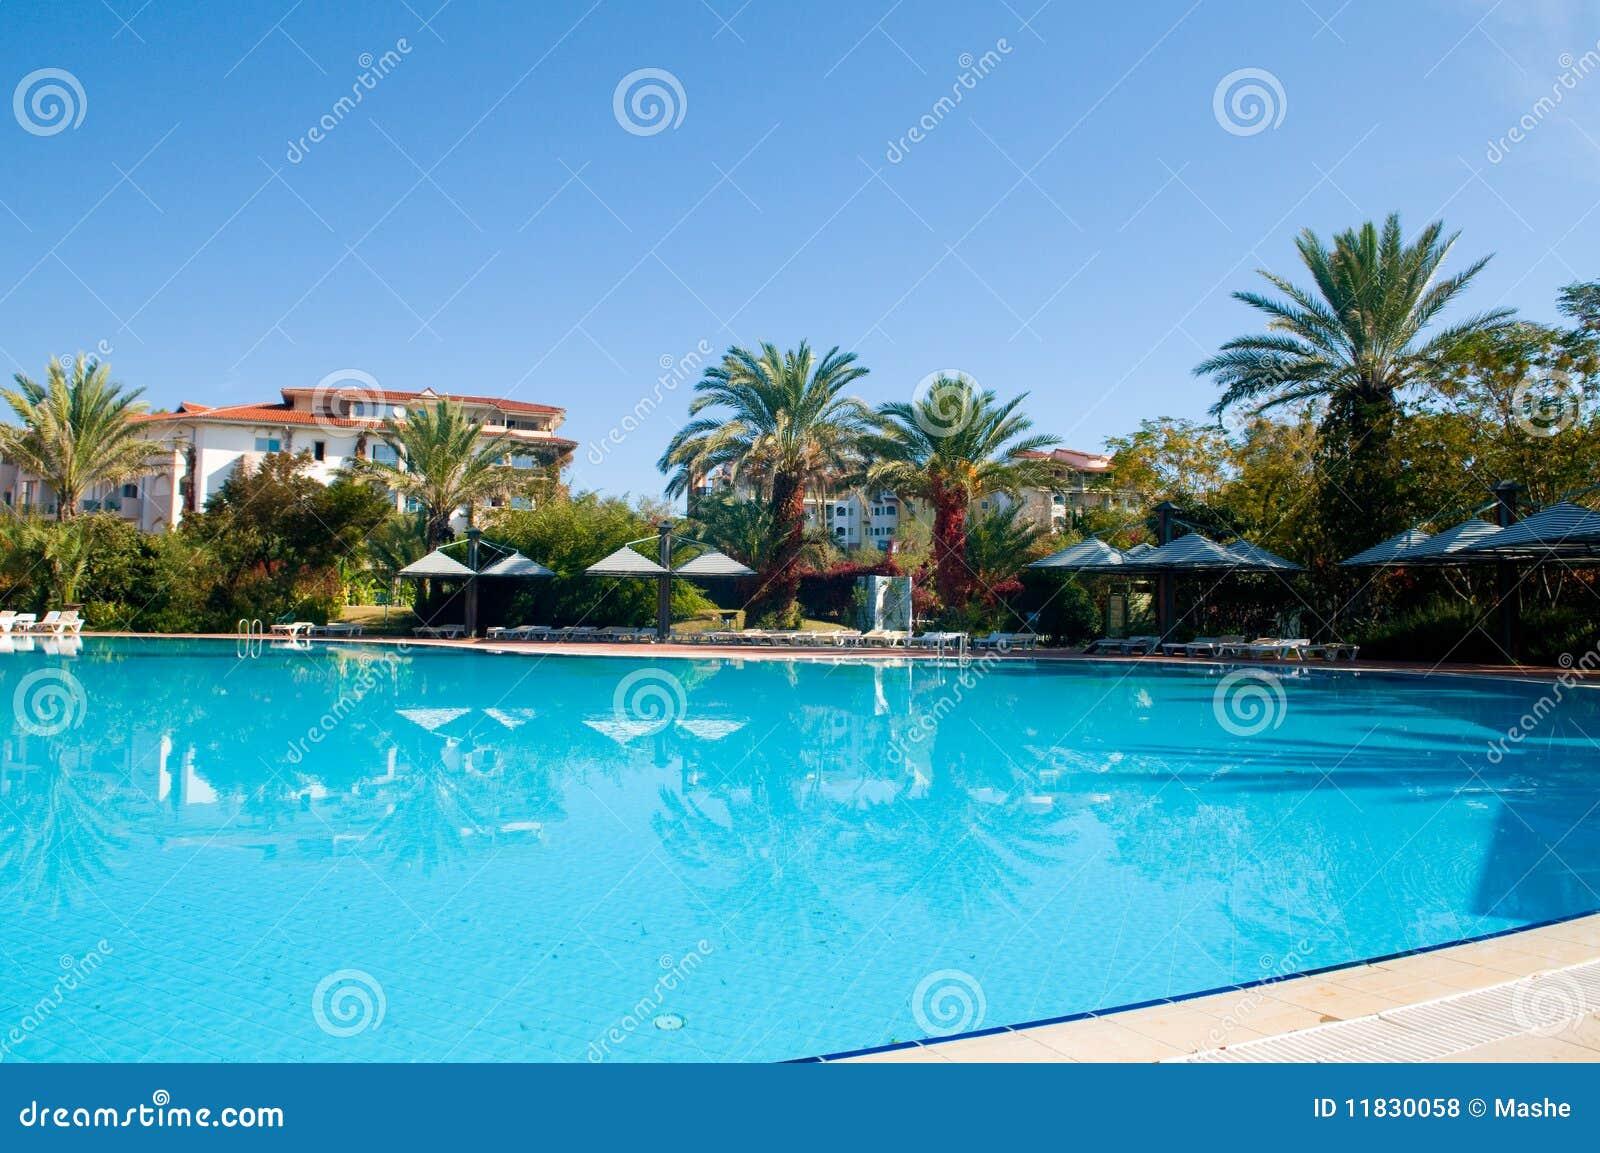 Beautiful Swimming Pool Royalty Free Stock Photos Image